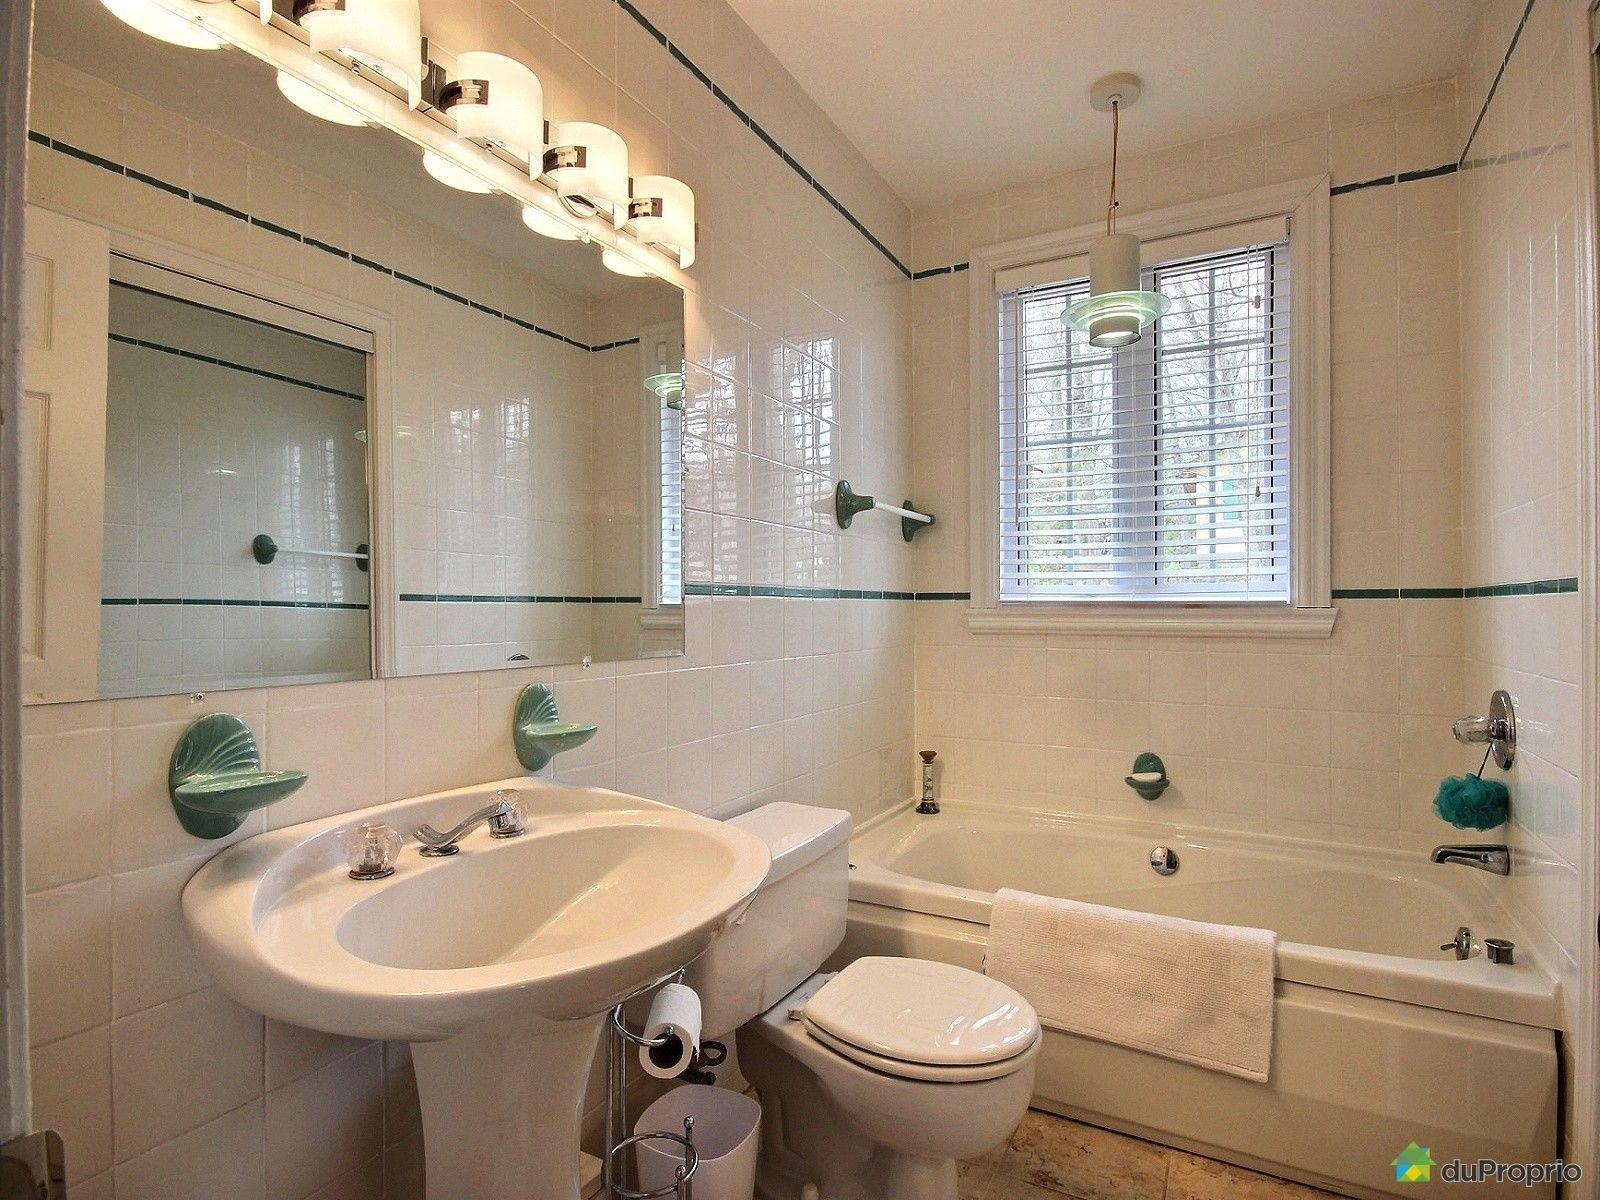 Maison vendre st jean chrysostome 1040 rue a lambert for Salle de bain st jean